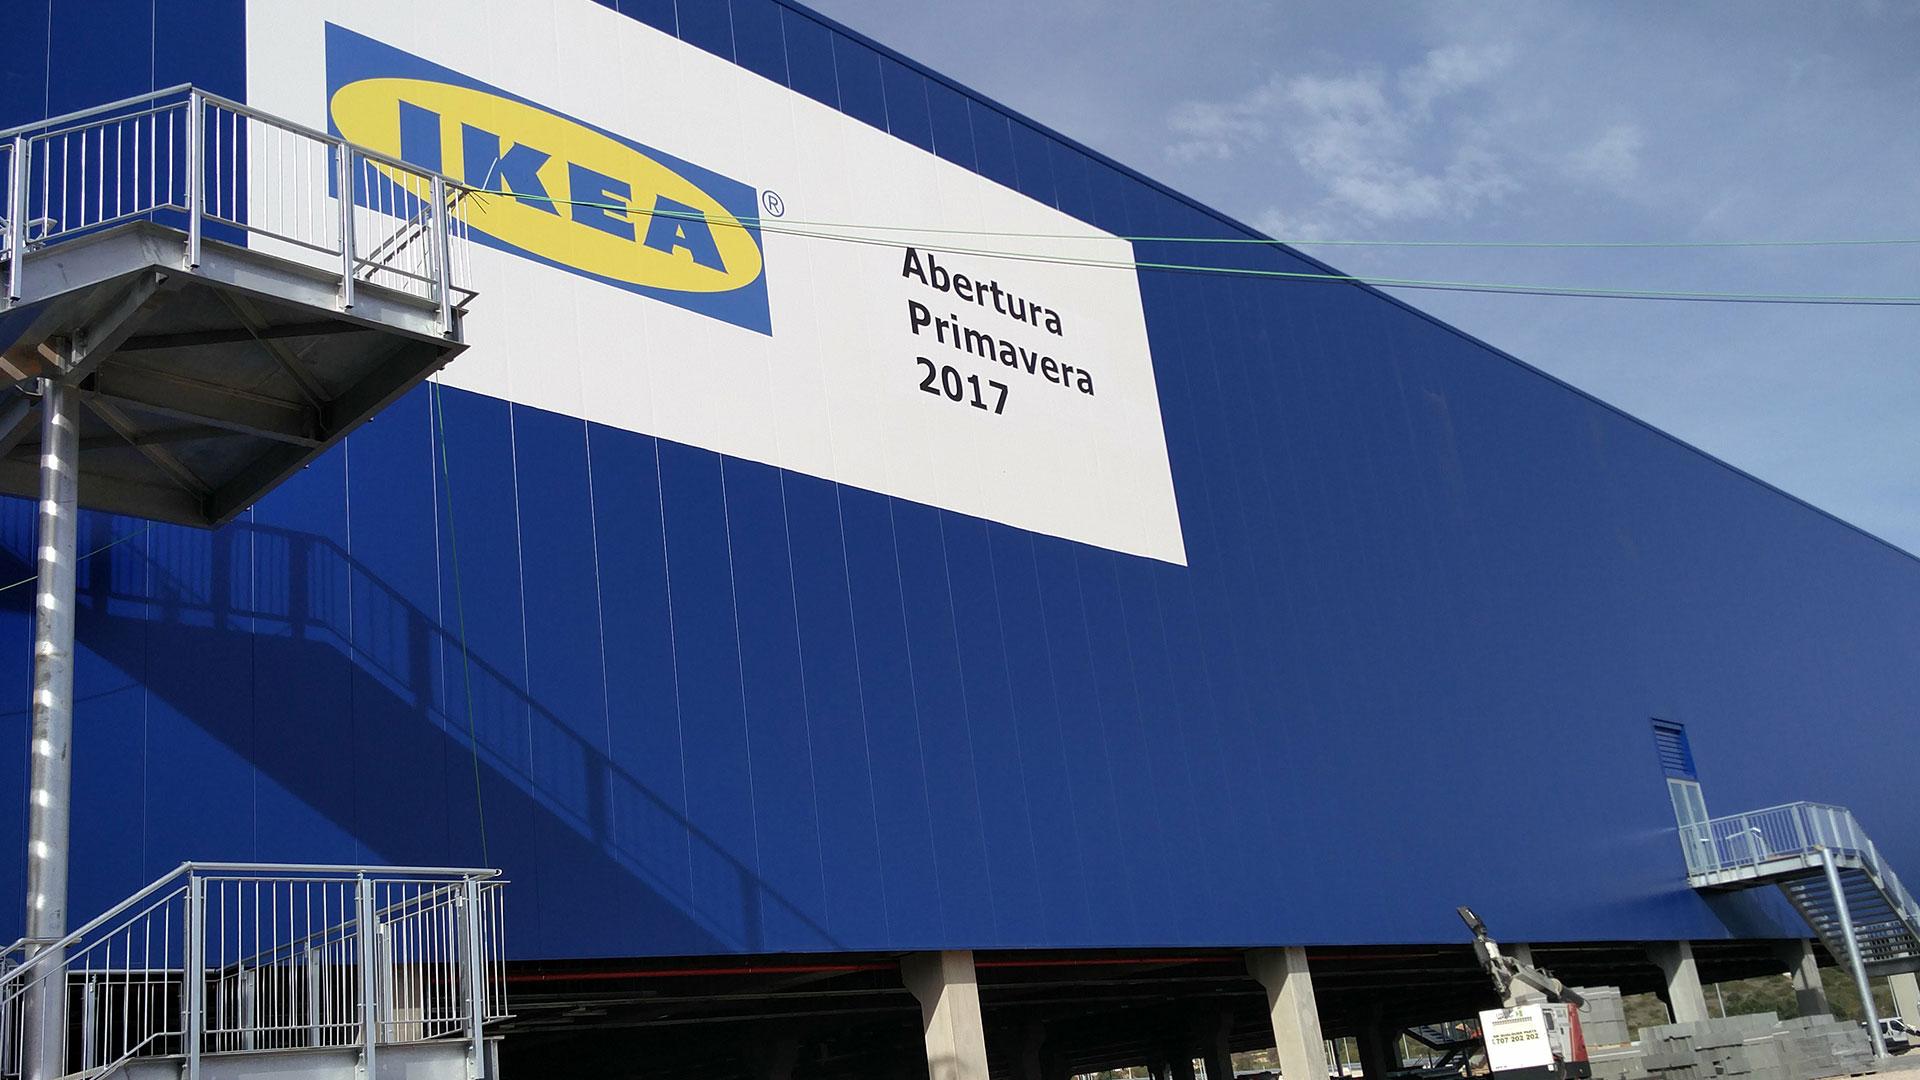 Quadrante magasin ikea de loul for Ikea houston heures de magasin